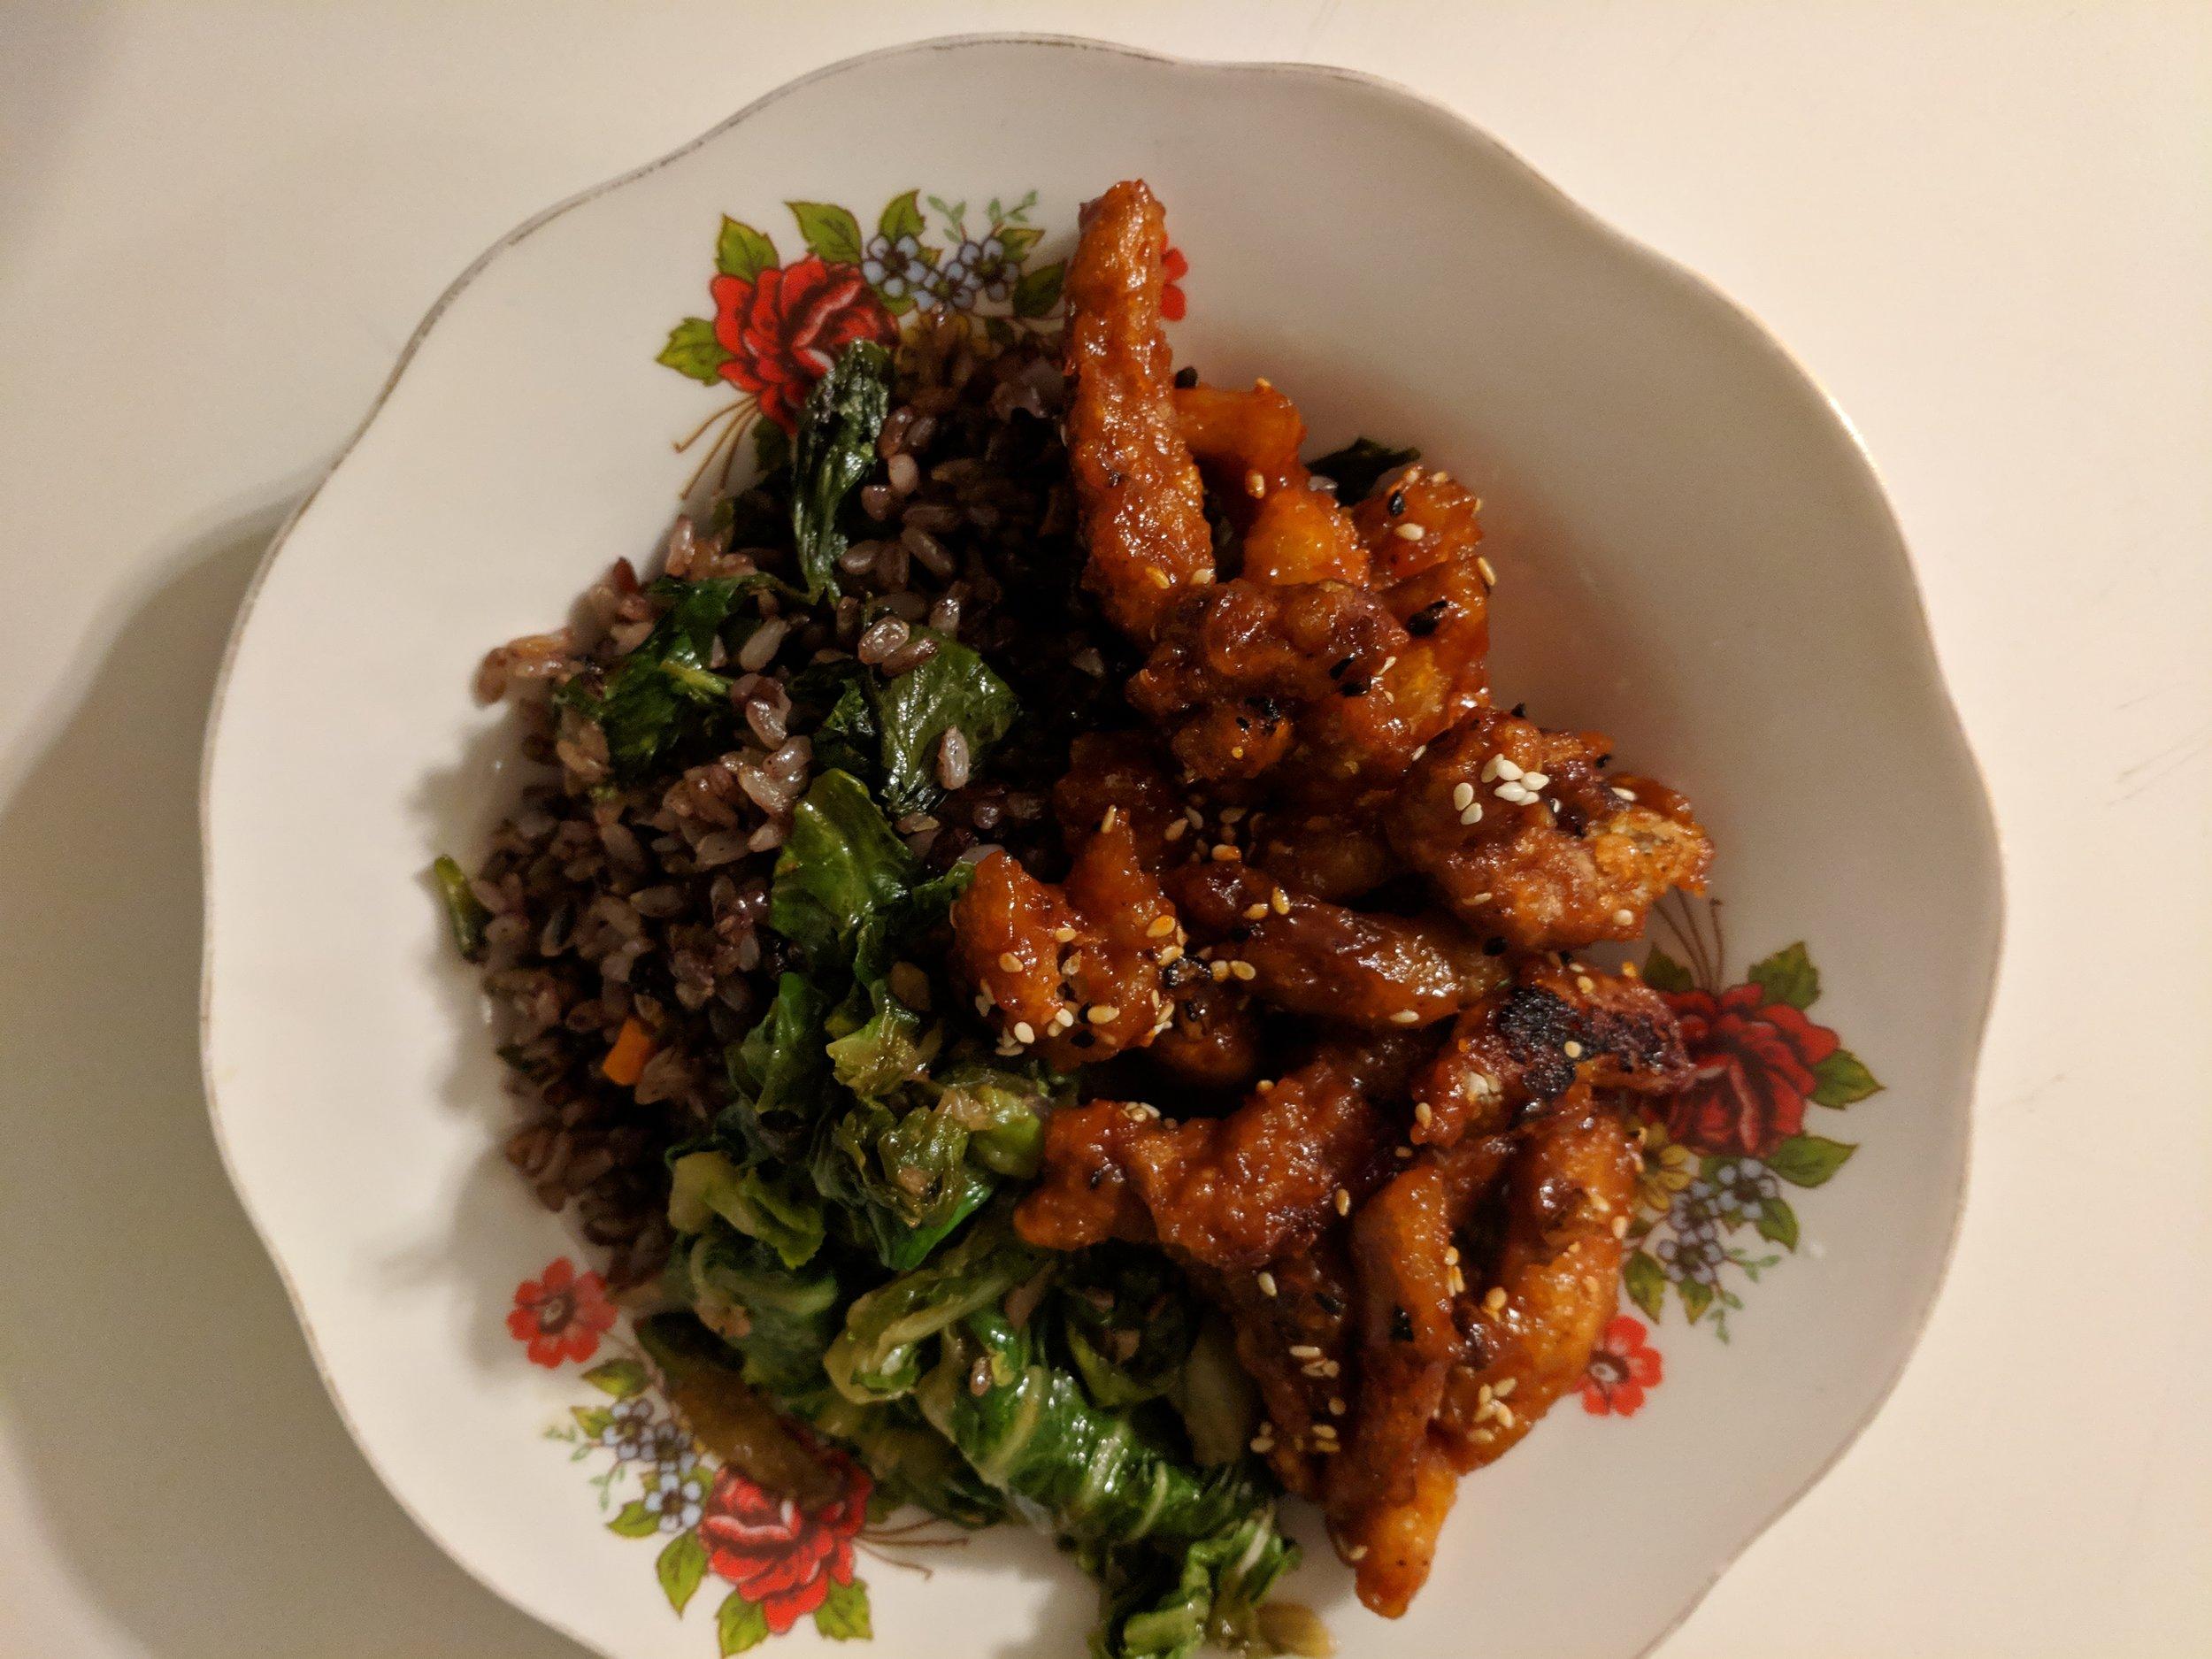 general tso's soy curls, sautéed napa and mixed grain & veggie fried rice